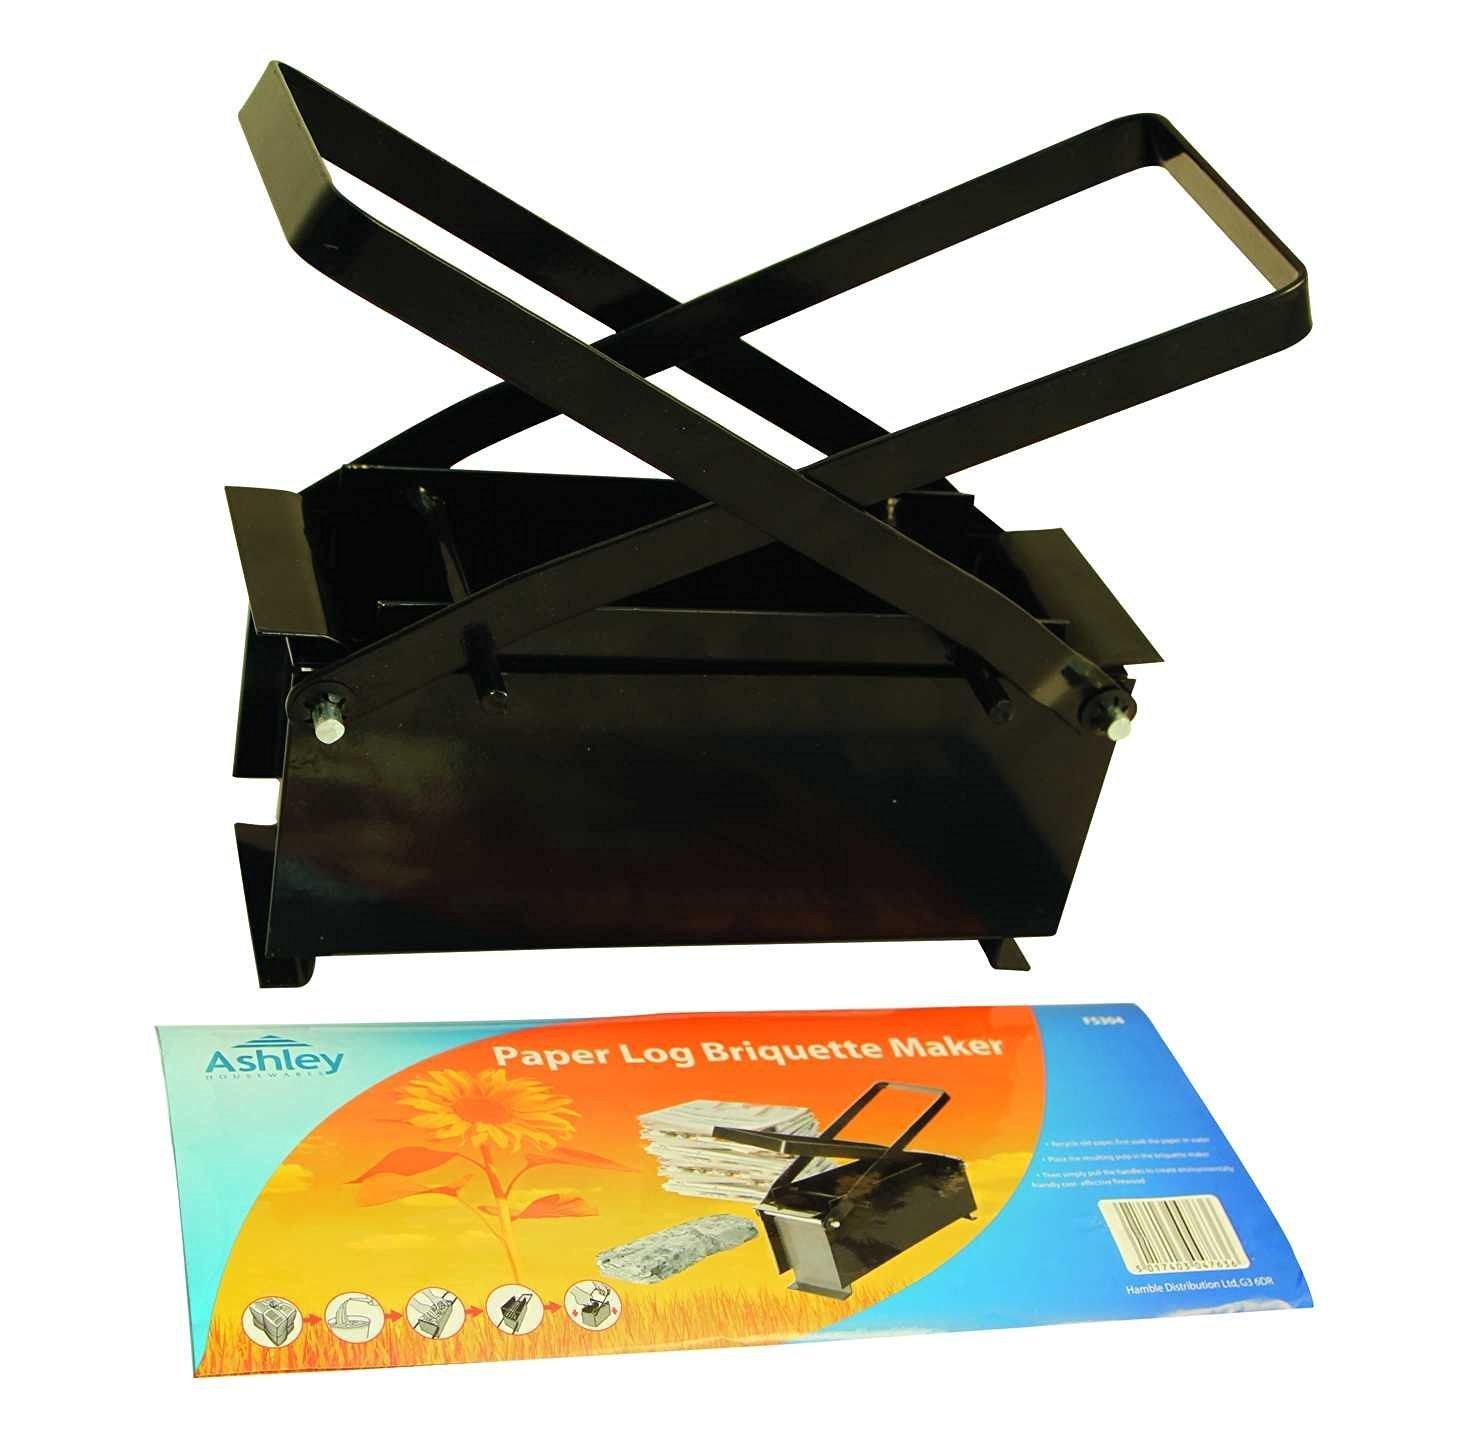 Black Metal Paper Log Briquette Maker Greenfingers ST-HA-BB-FS304